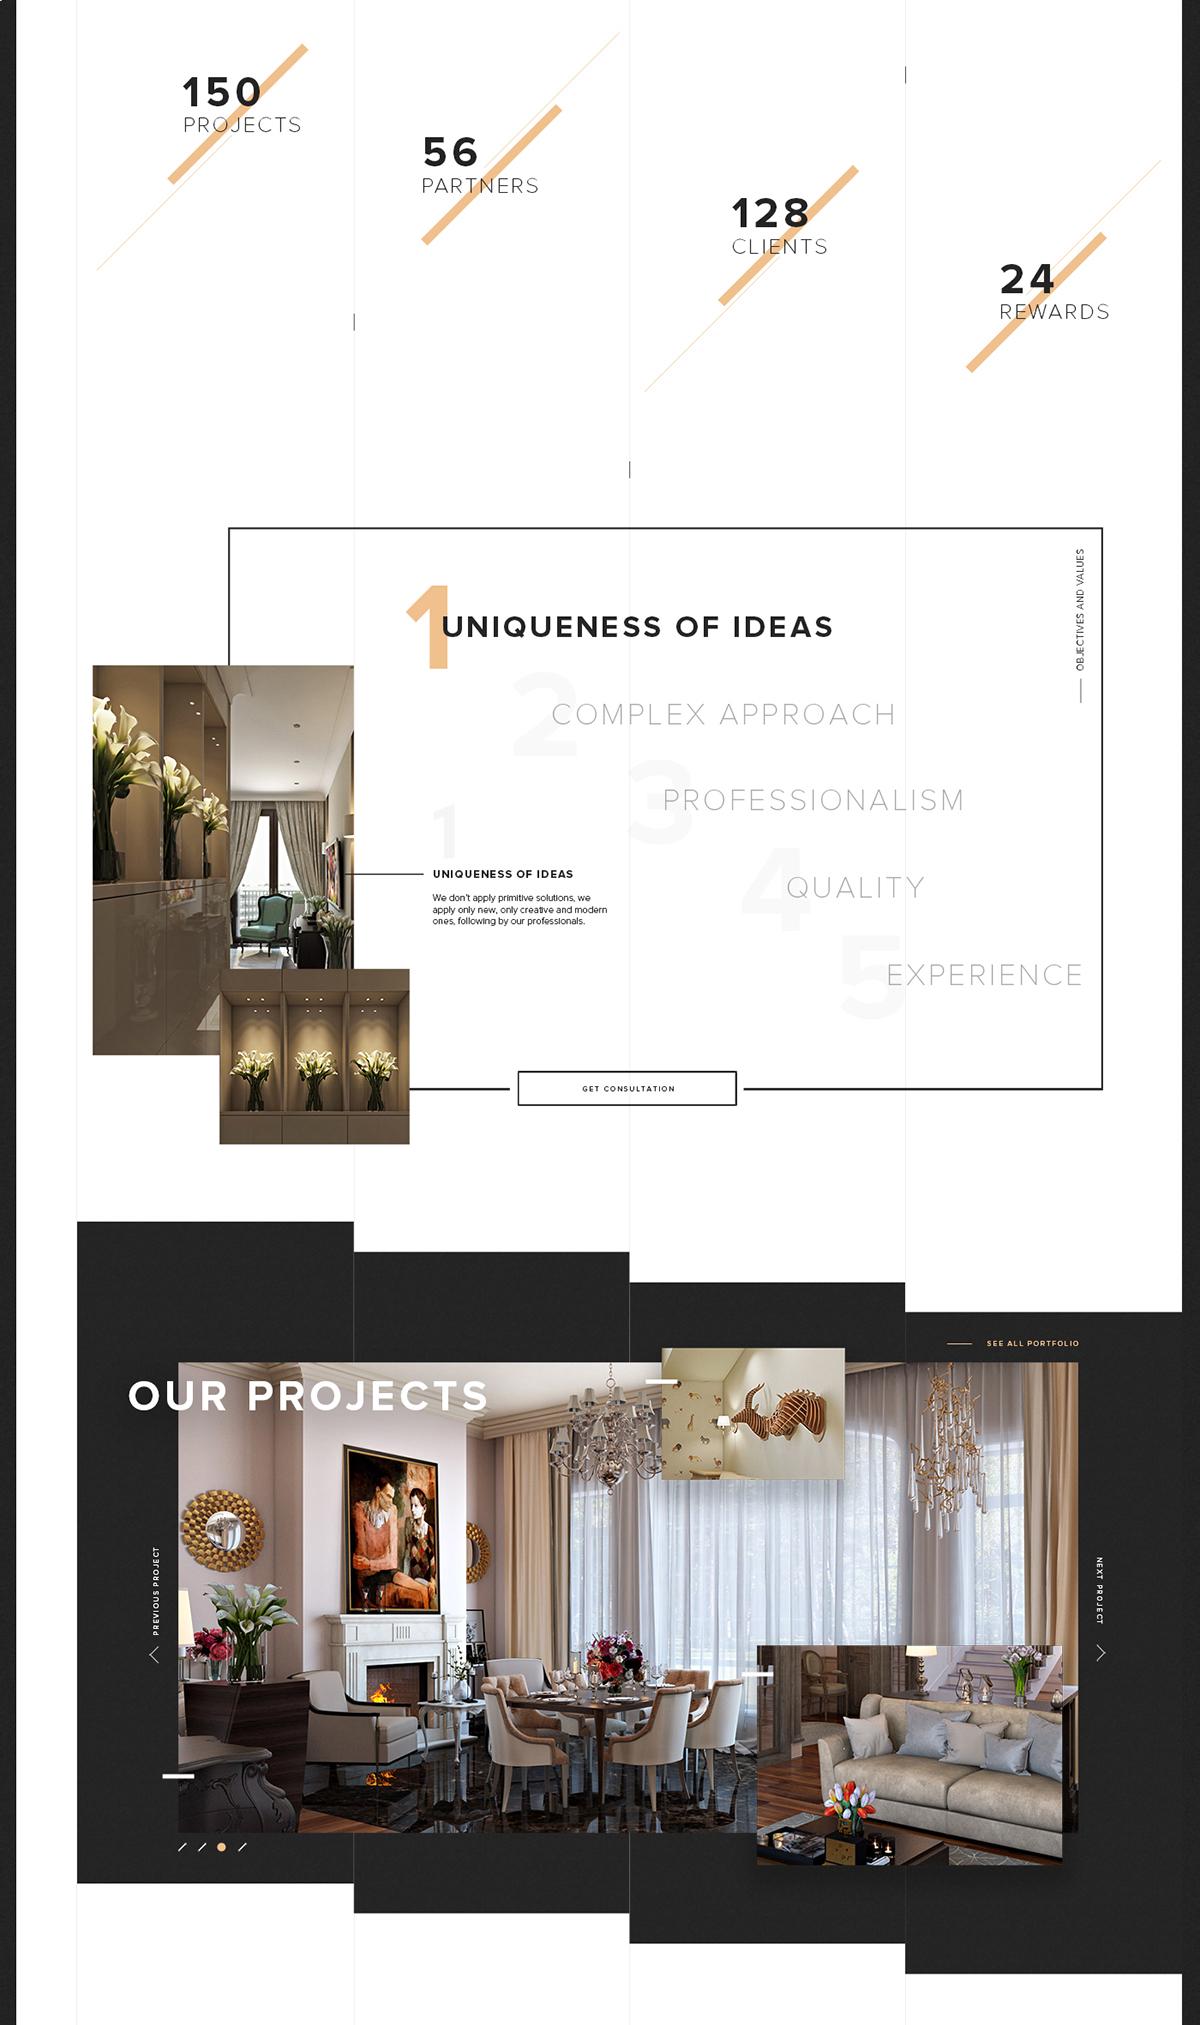 Desartdecor interior design website on student show for Interior design pricing strategy